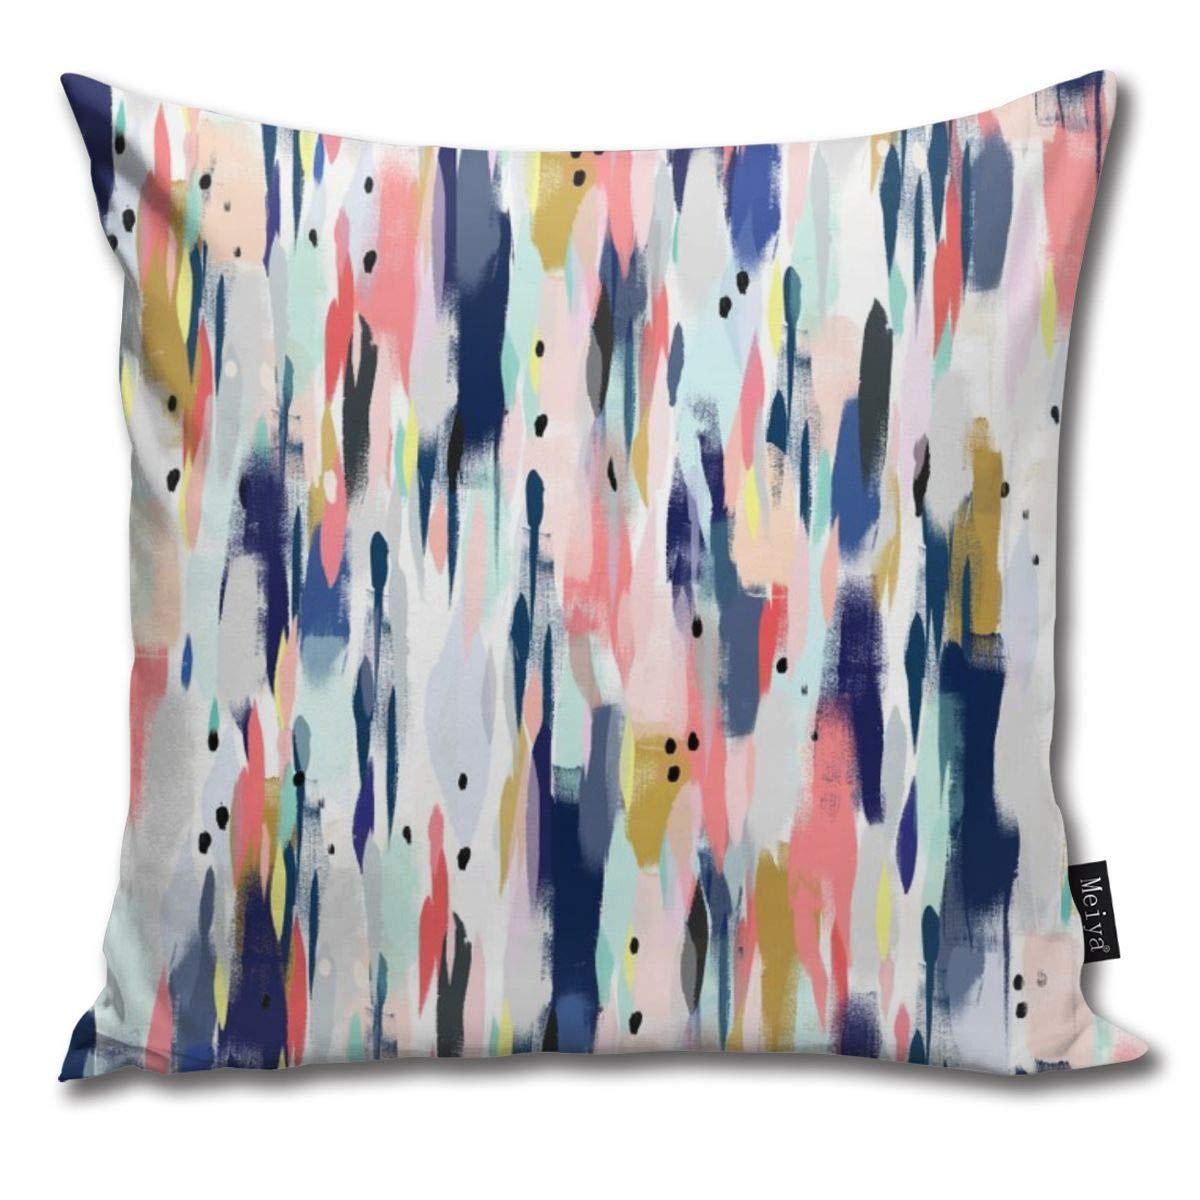 CAPSOCKS Illumination Pillowcase Home Life Cotton Cushion ...